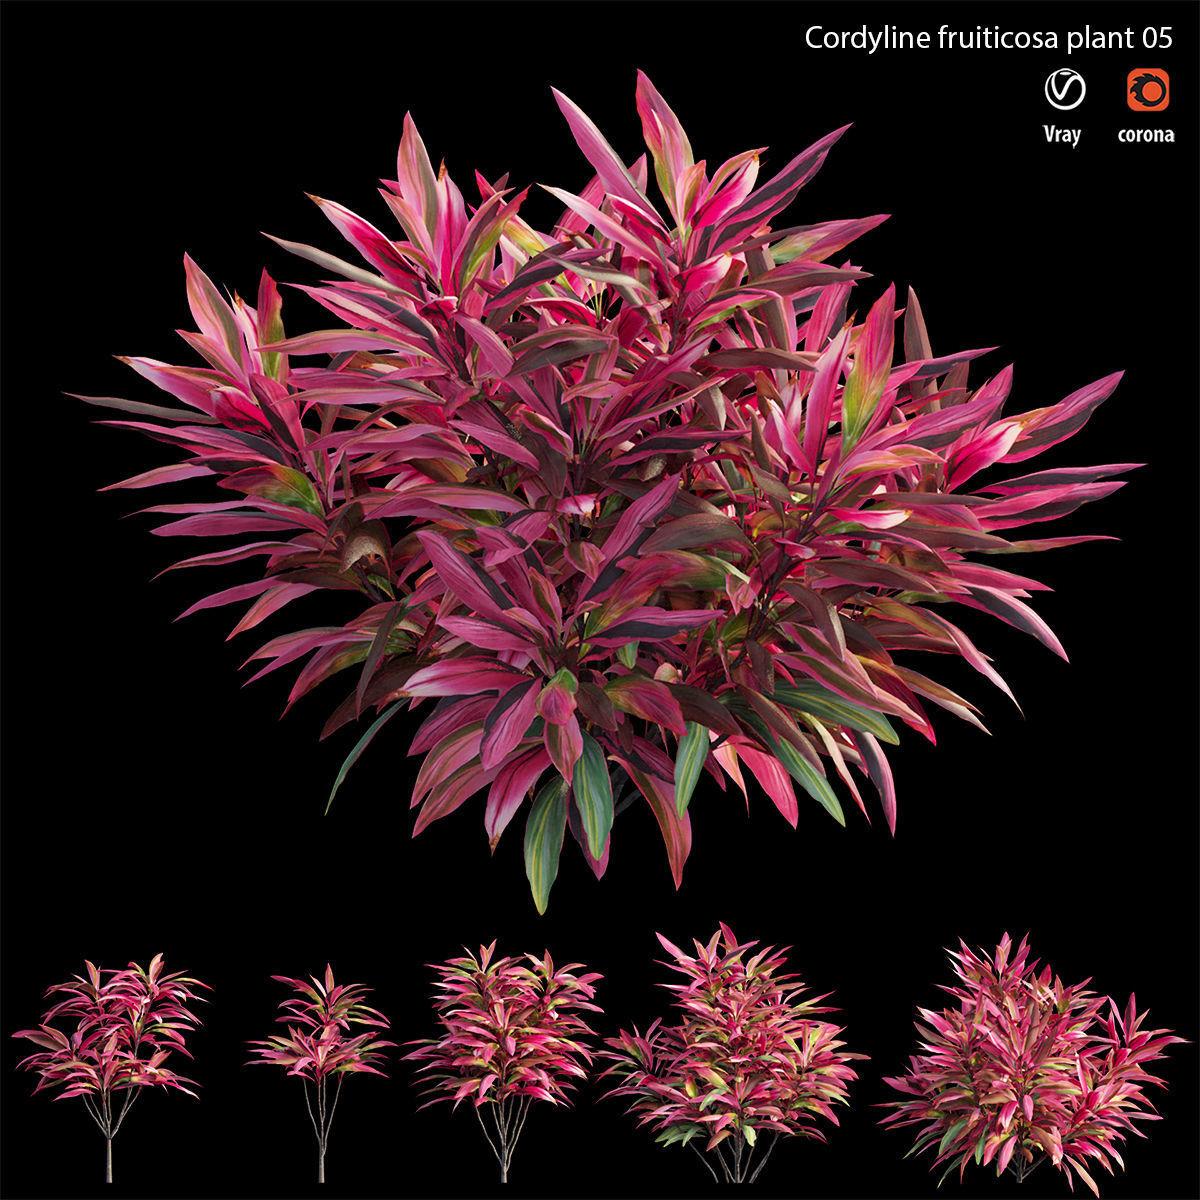 Cordyline fruticosa plant set 05